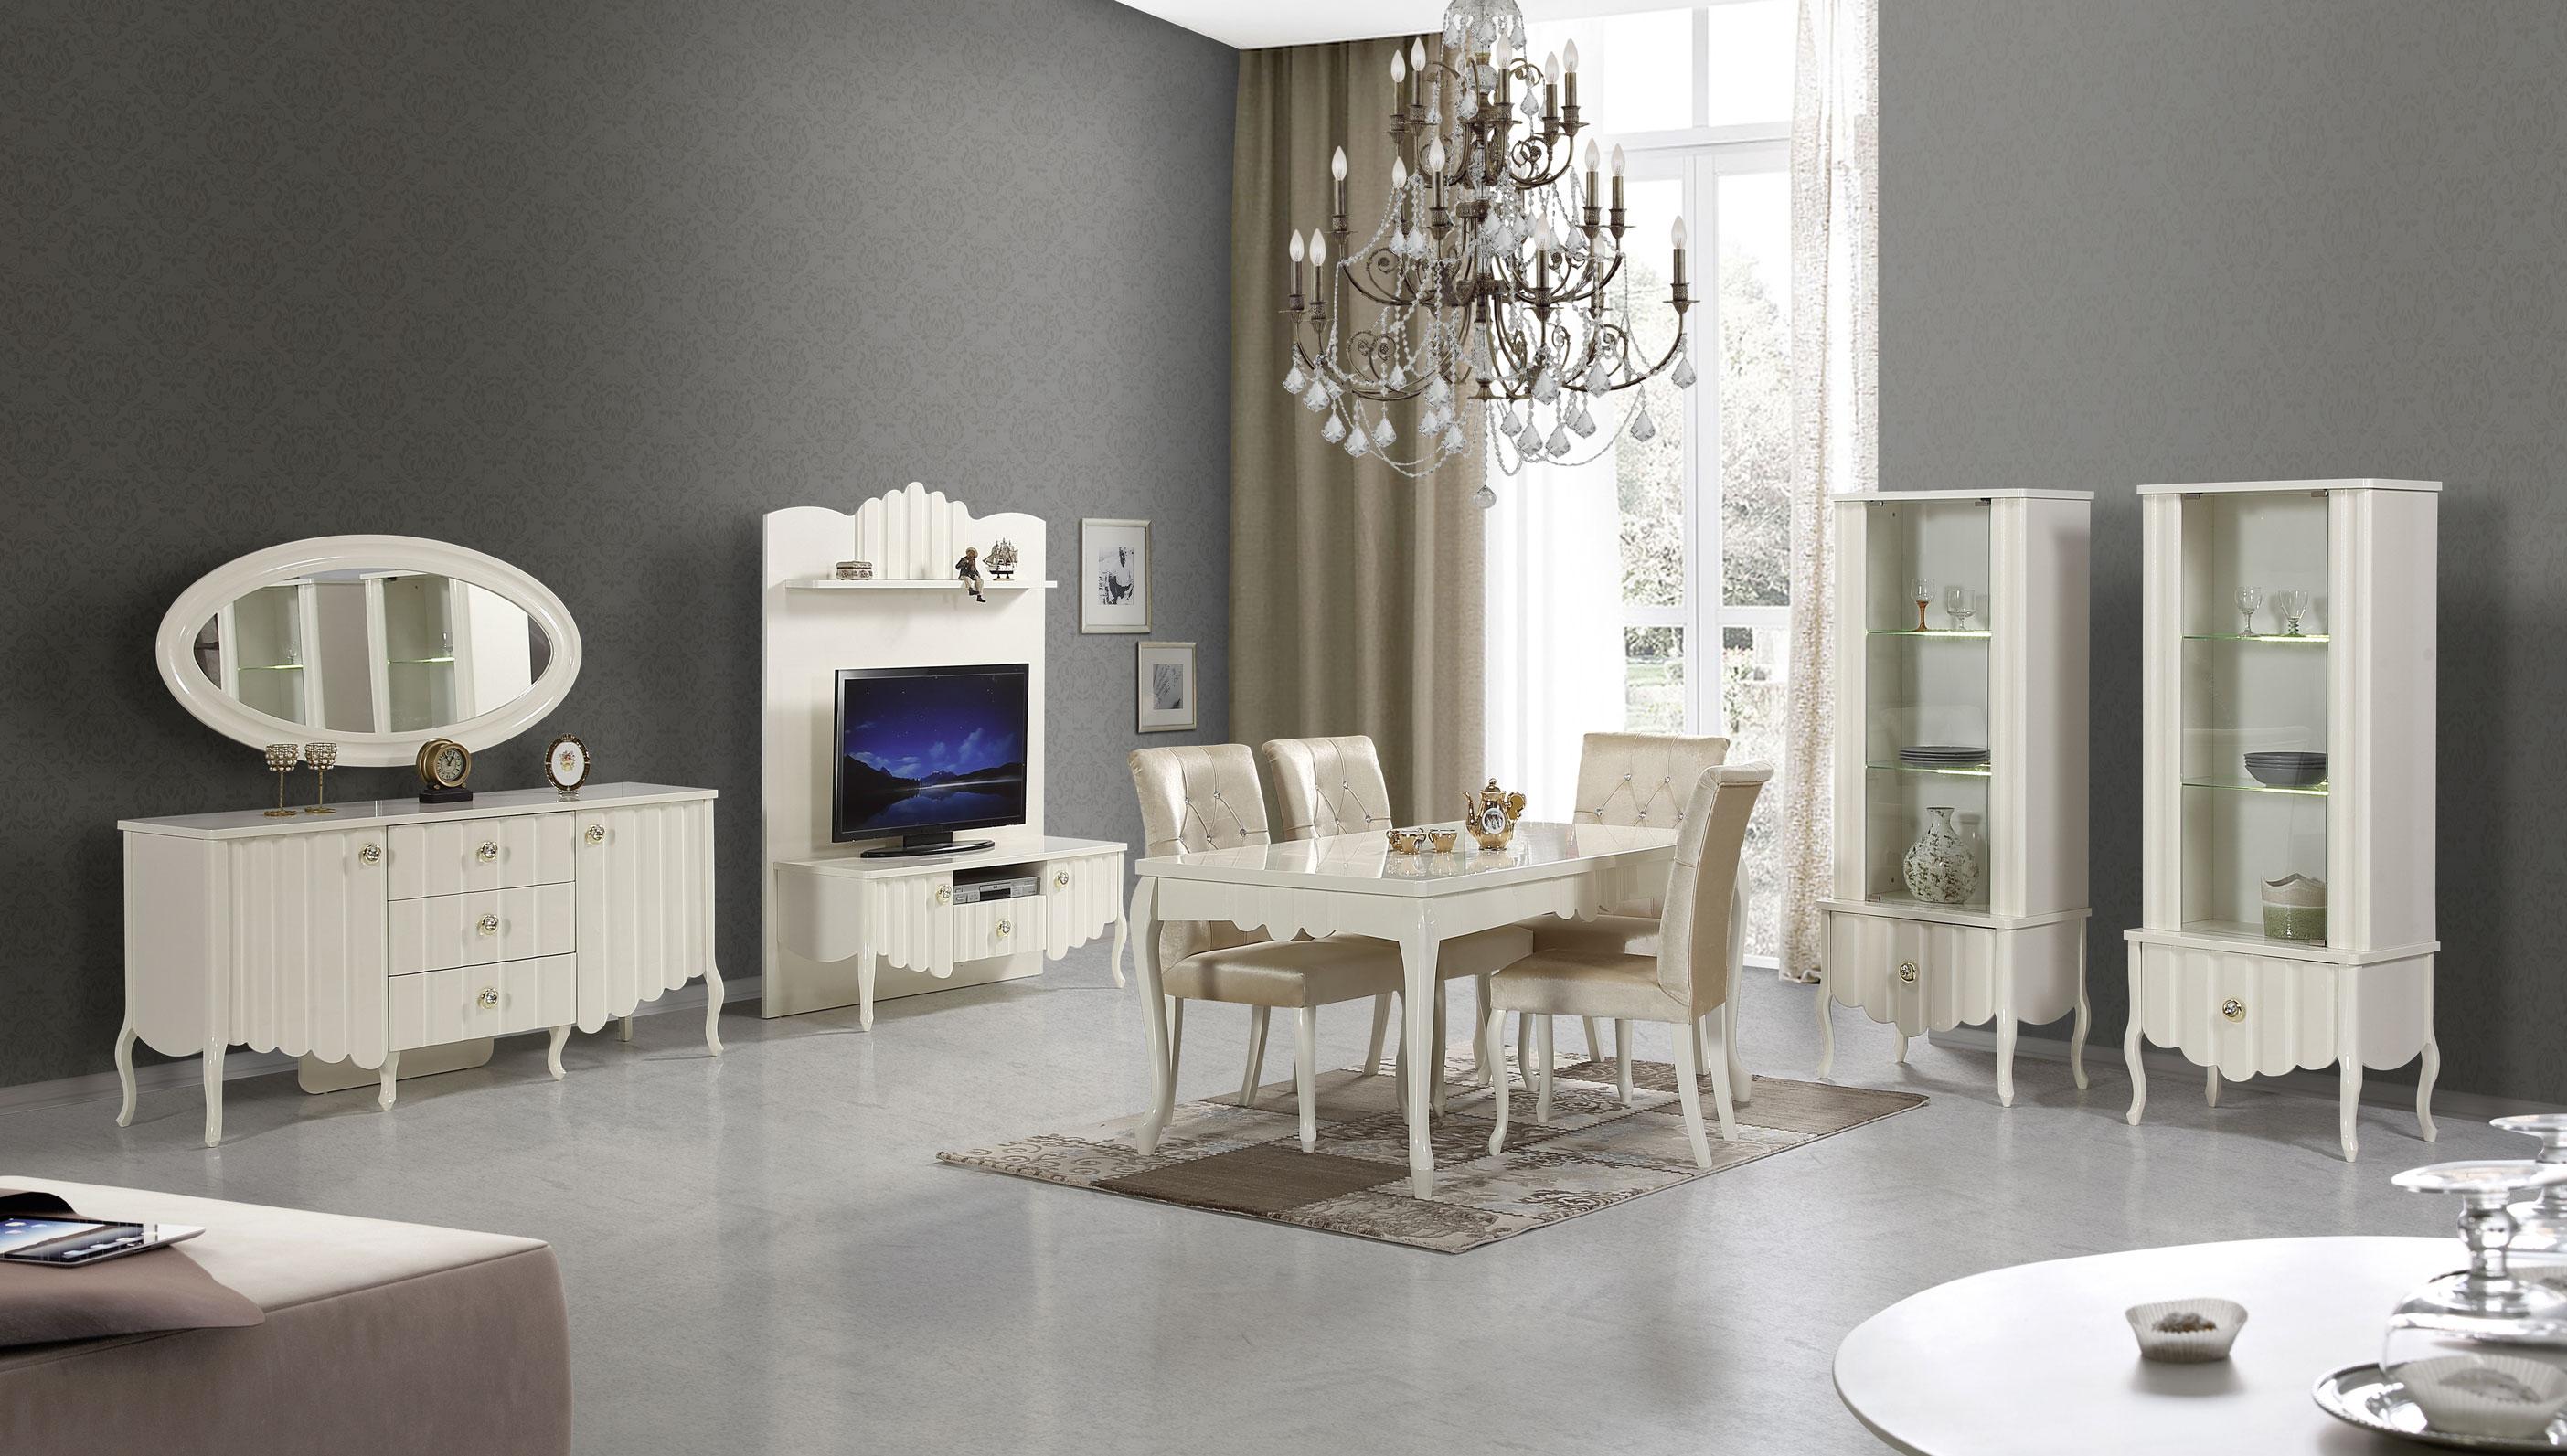 tutku esszimmer yuvam m belhaus in wuppertal cilek offizieller h ndler in europa. Black Bedroom Furniture Sets. Home Design Ideas